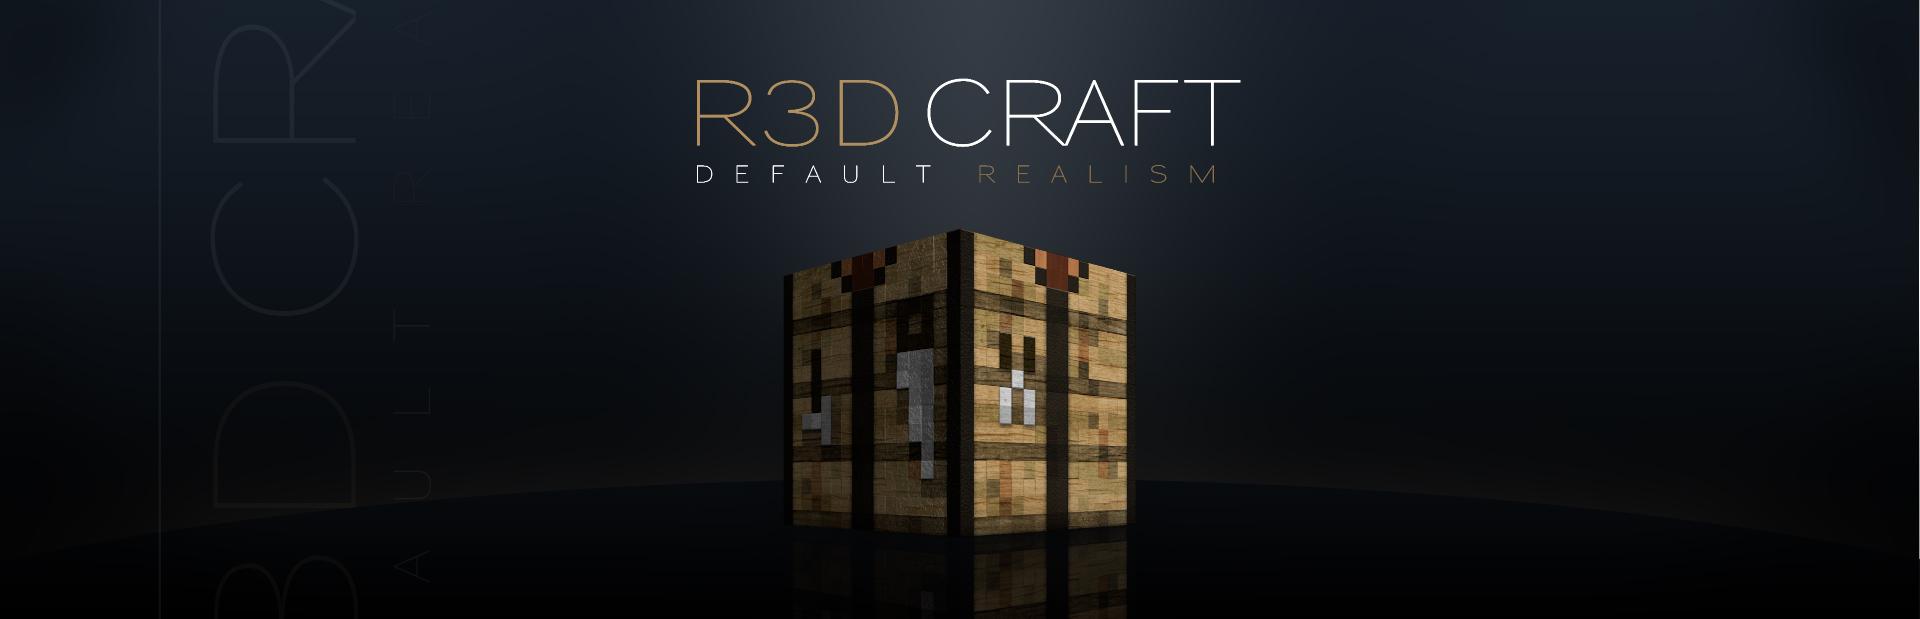 R3D-CRAFT.jpg